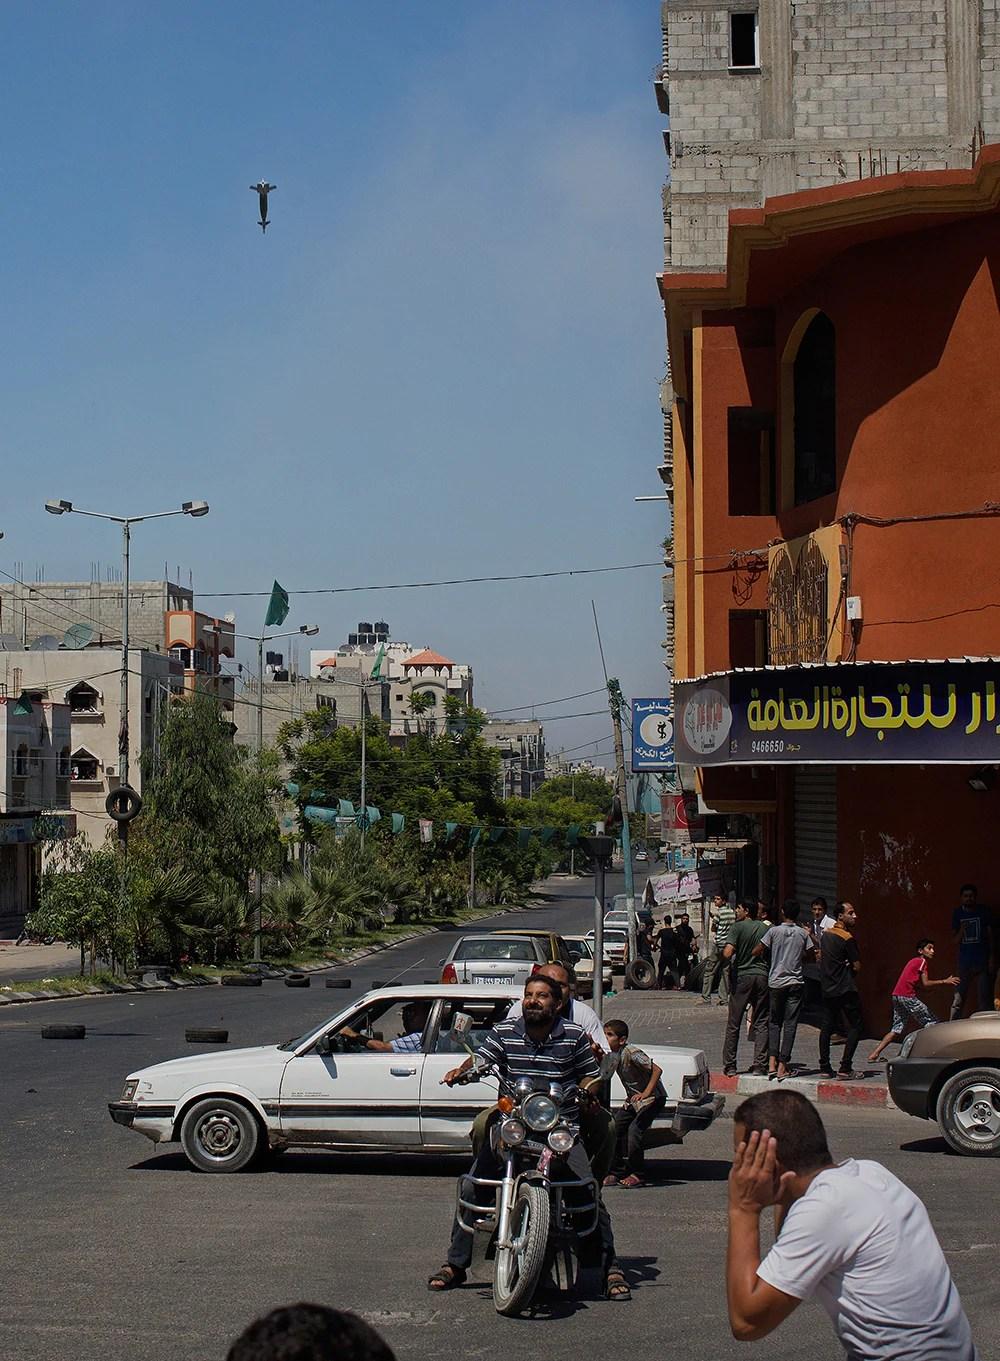 Sudarsan Raghavan - Gaza City bomb